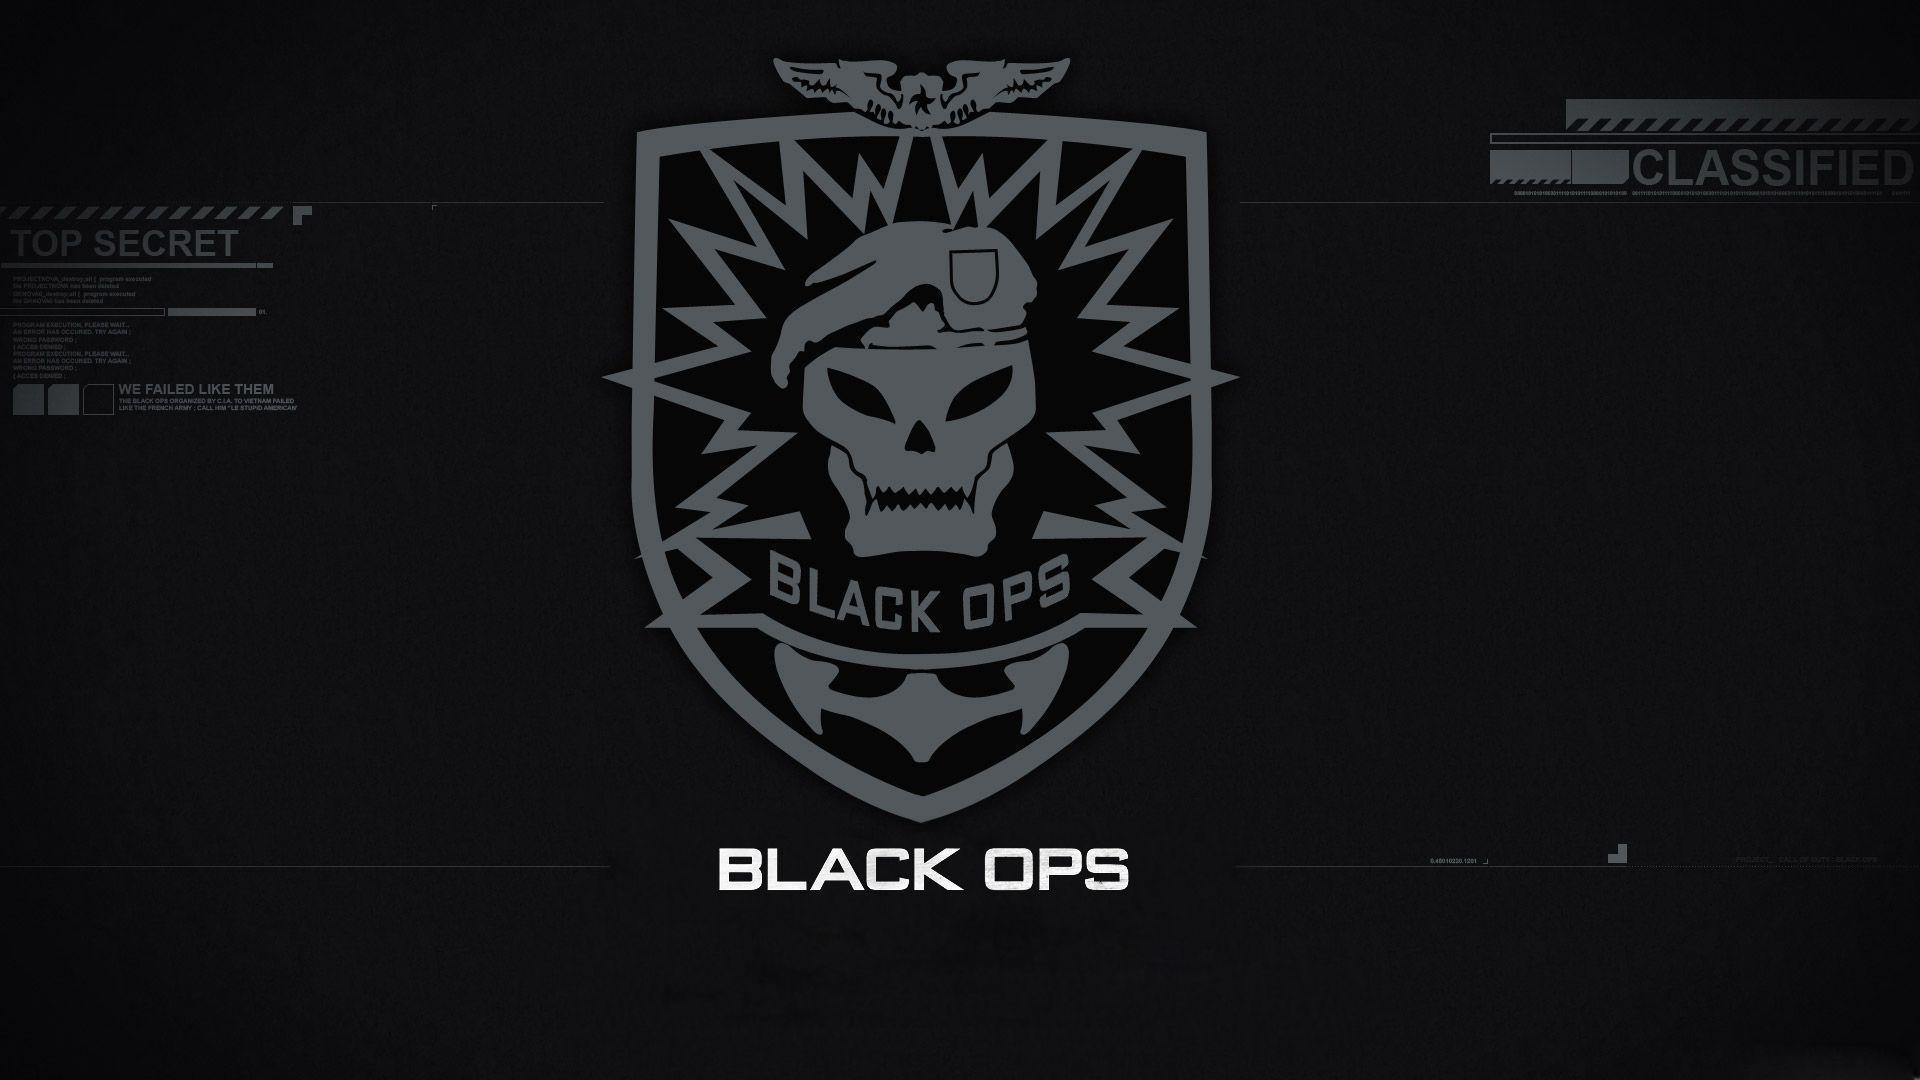 Black Ops 2 Origins Wallpaper, PC, Laptop 44 Black Ops 2 Origins .